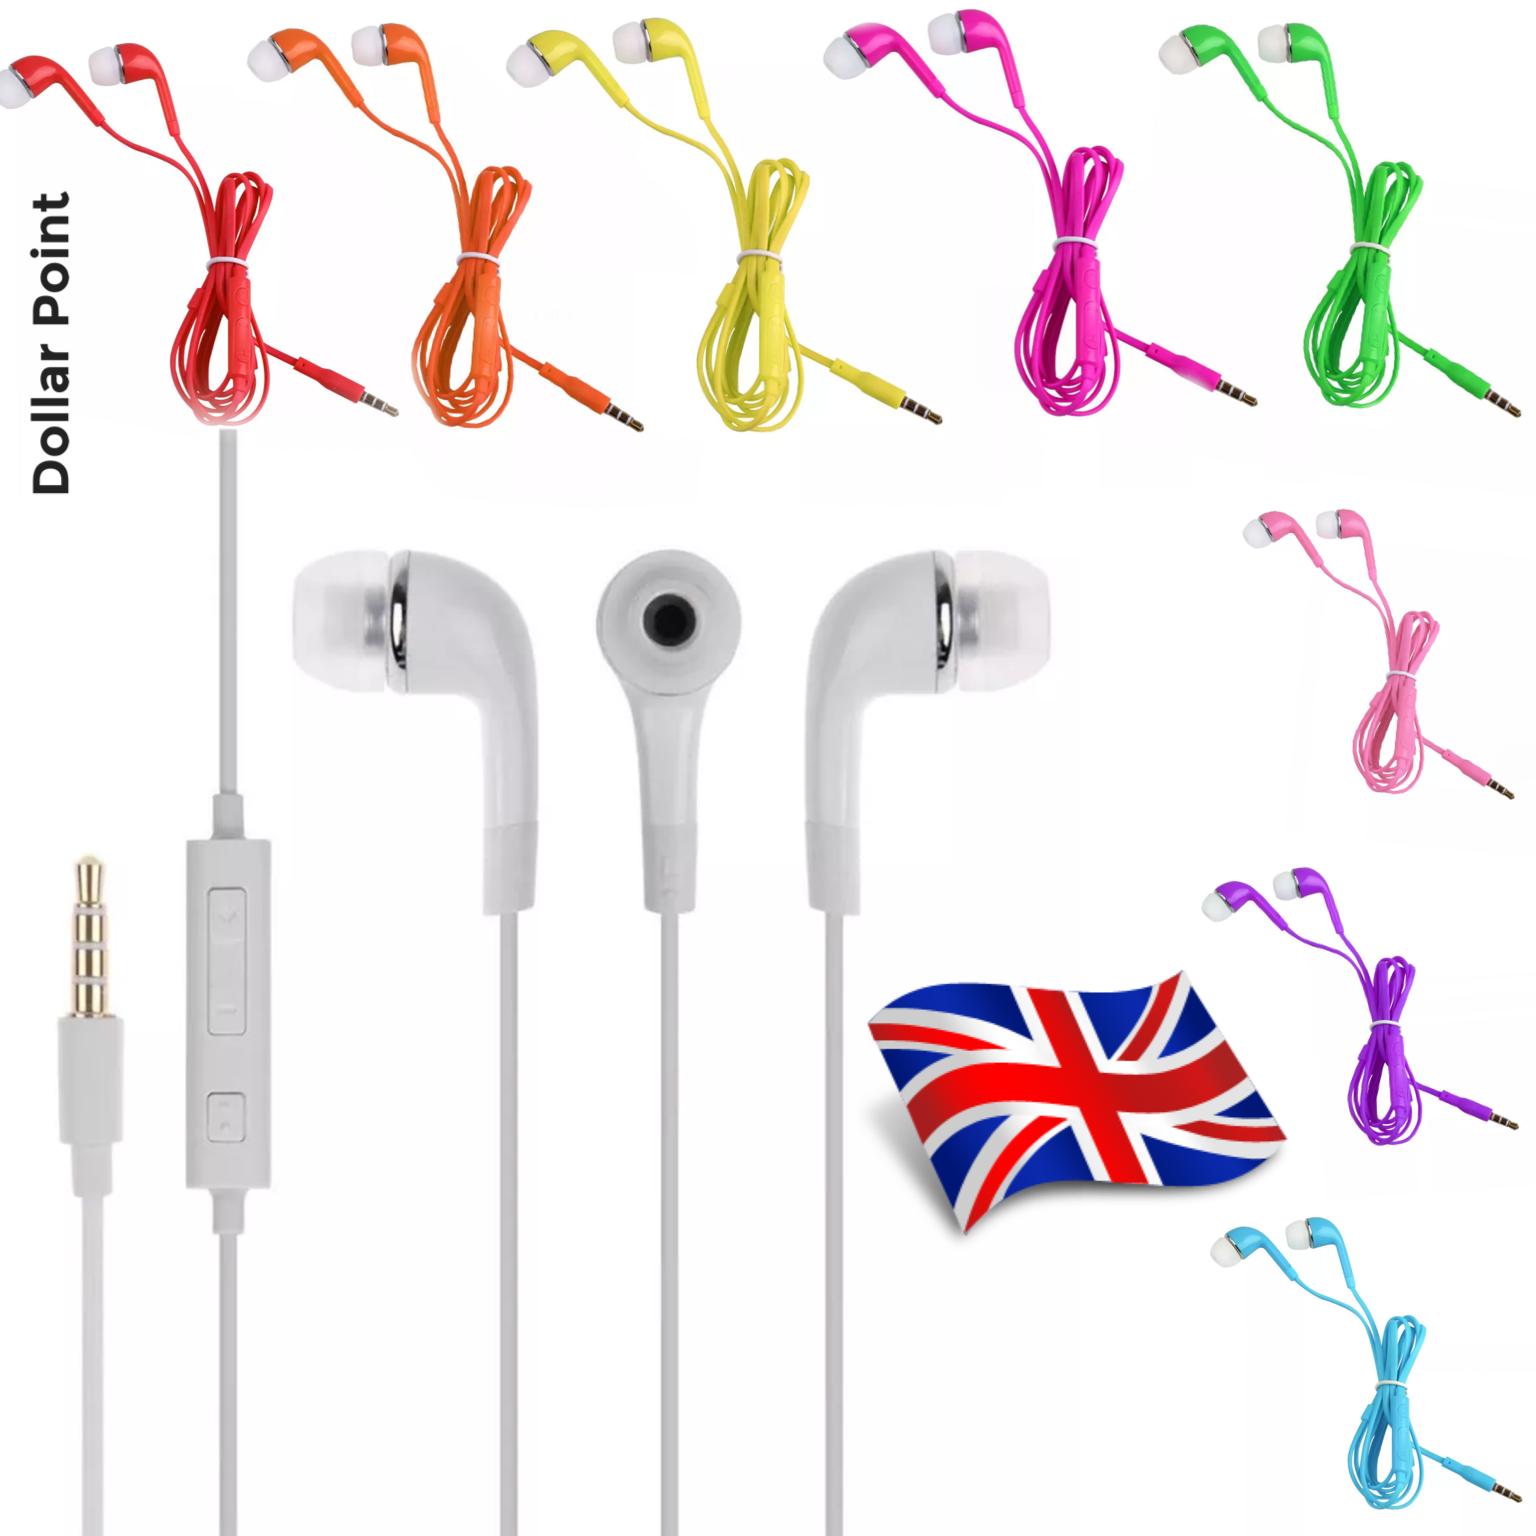 Colourful Noise Isolating Handsfree Headphones Earphones Earbud with Mic